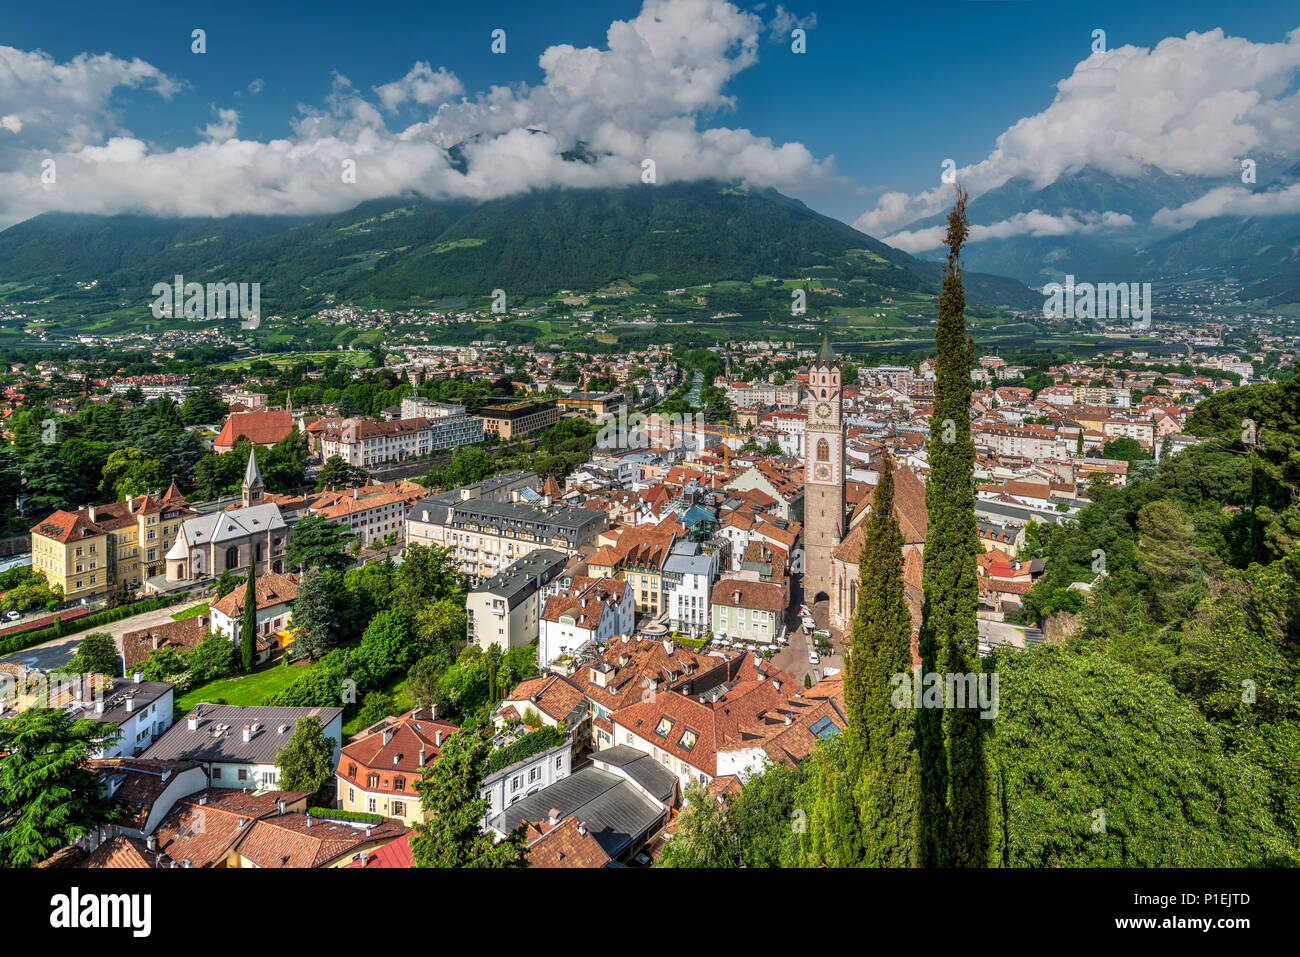 Merano - Meran, Trentino Alto Adige - South Tyrol, Italy - Stock Image